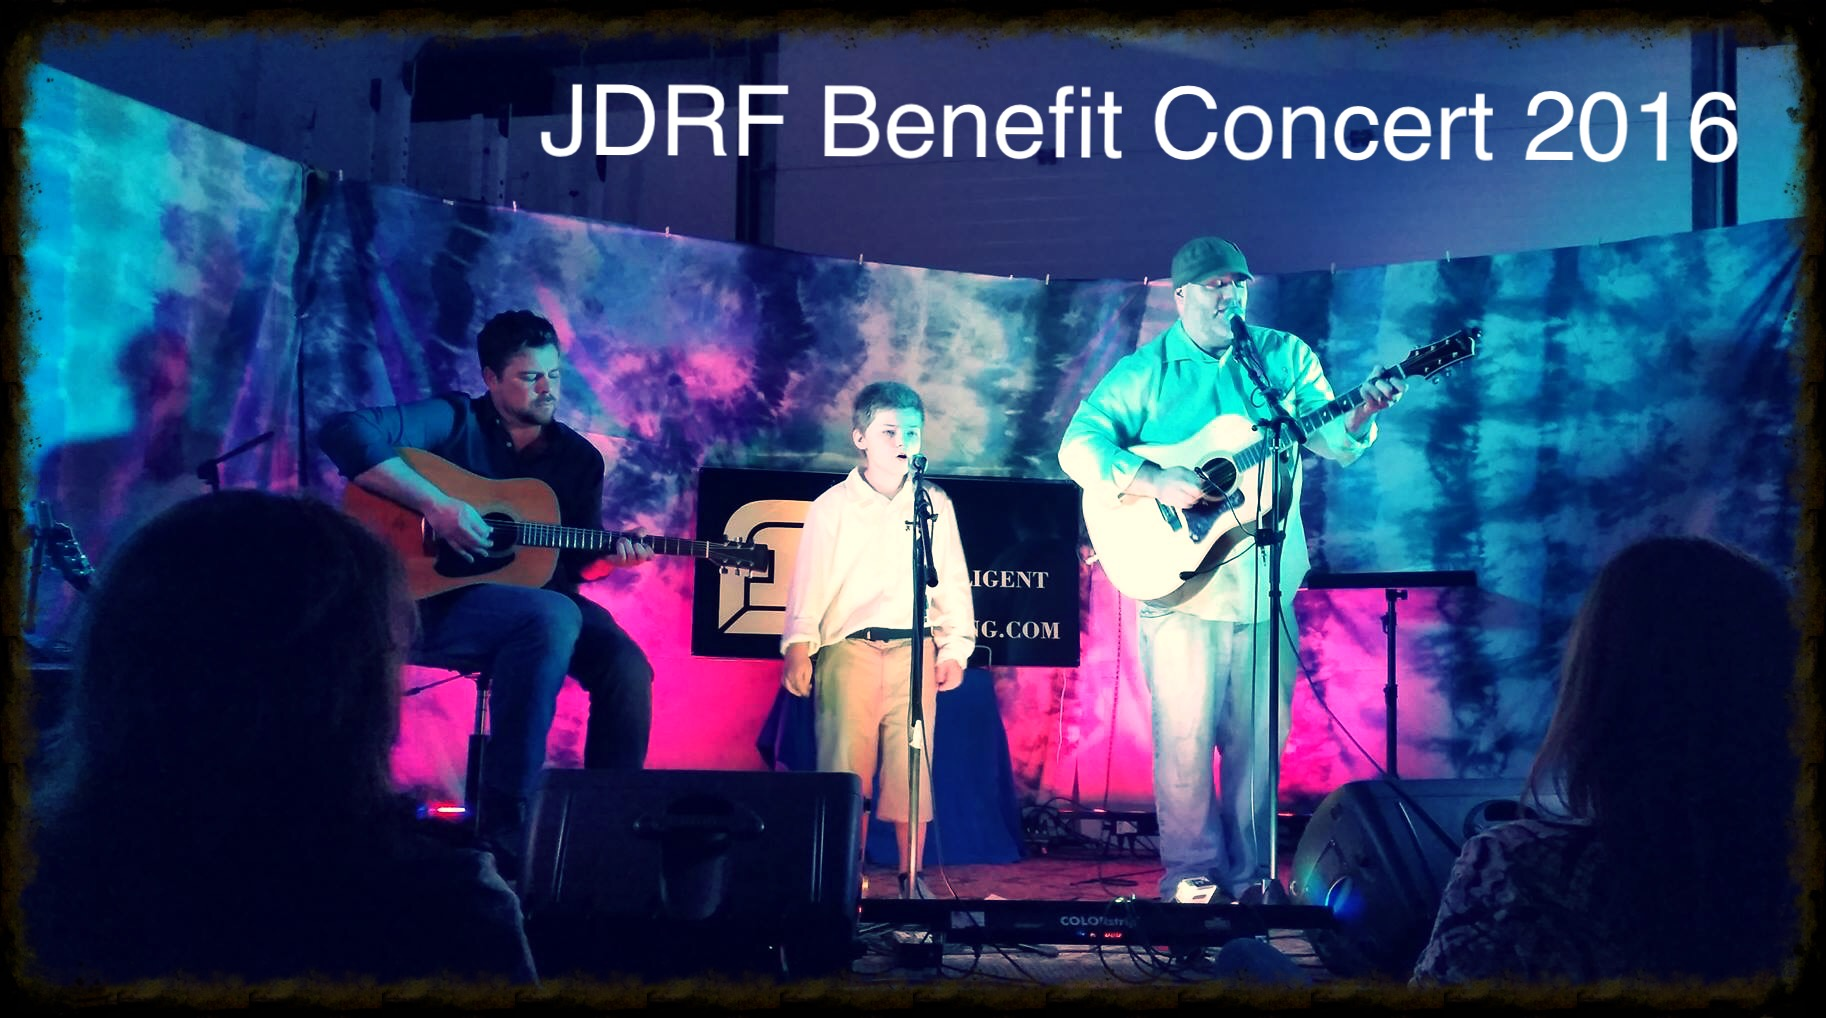 JDRF Benefit Concert 2016 with Matt's son Connor